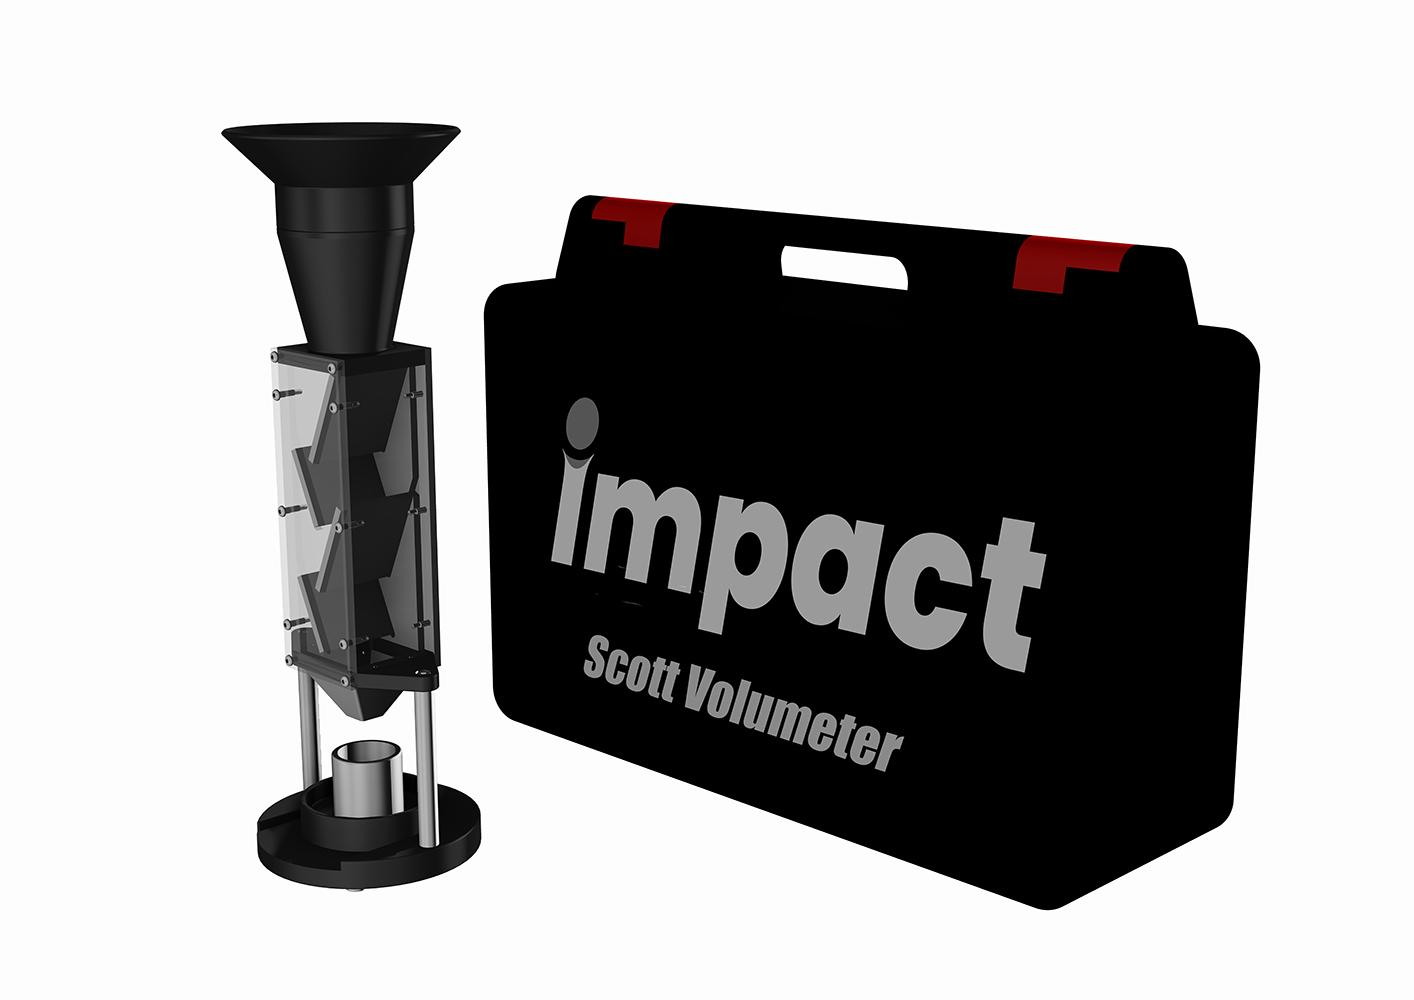 Cold Spray Equipment Scott Volumeter kit